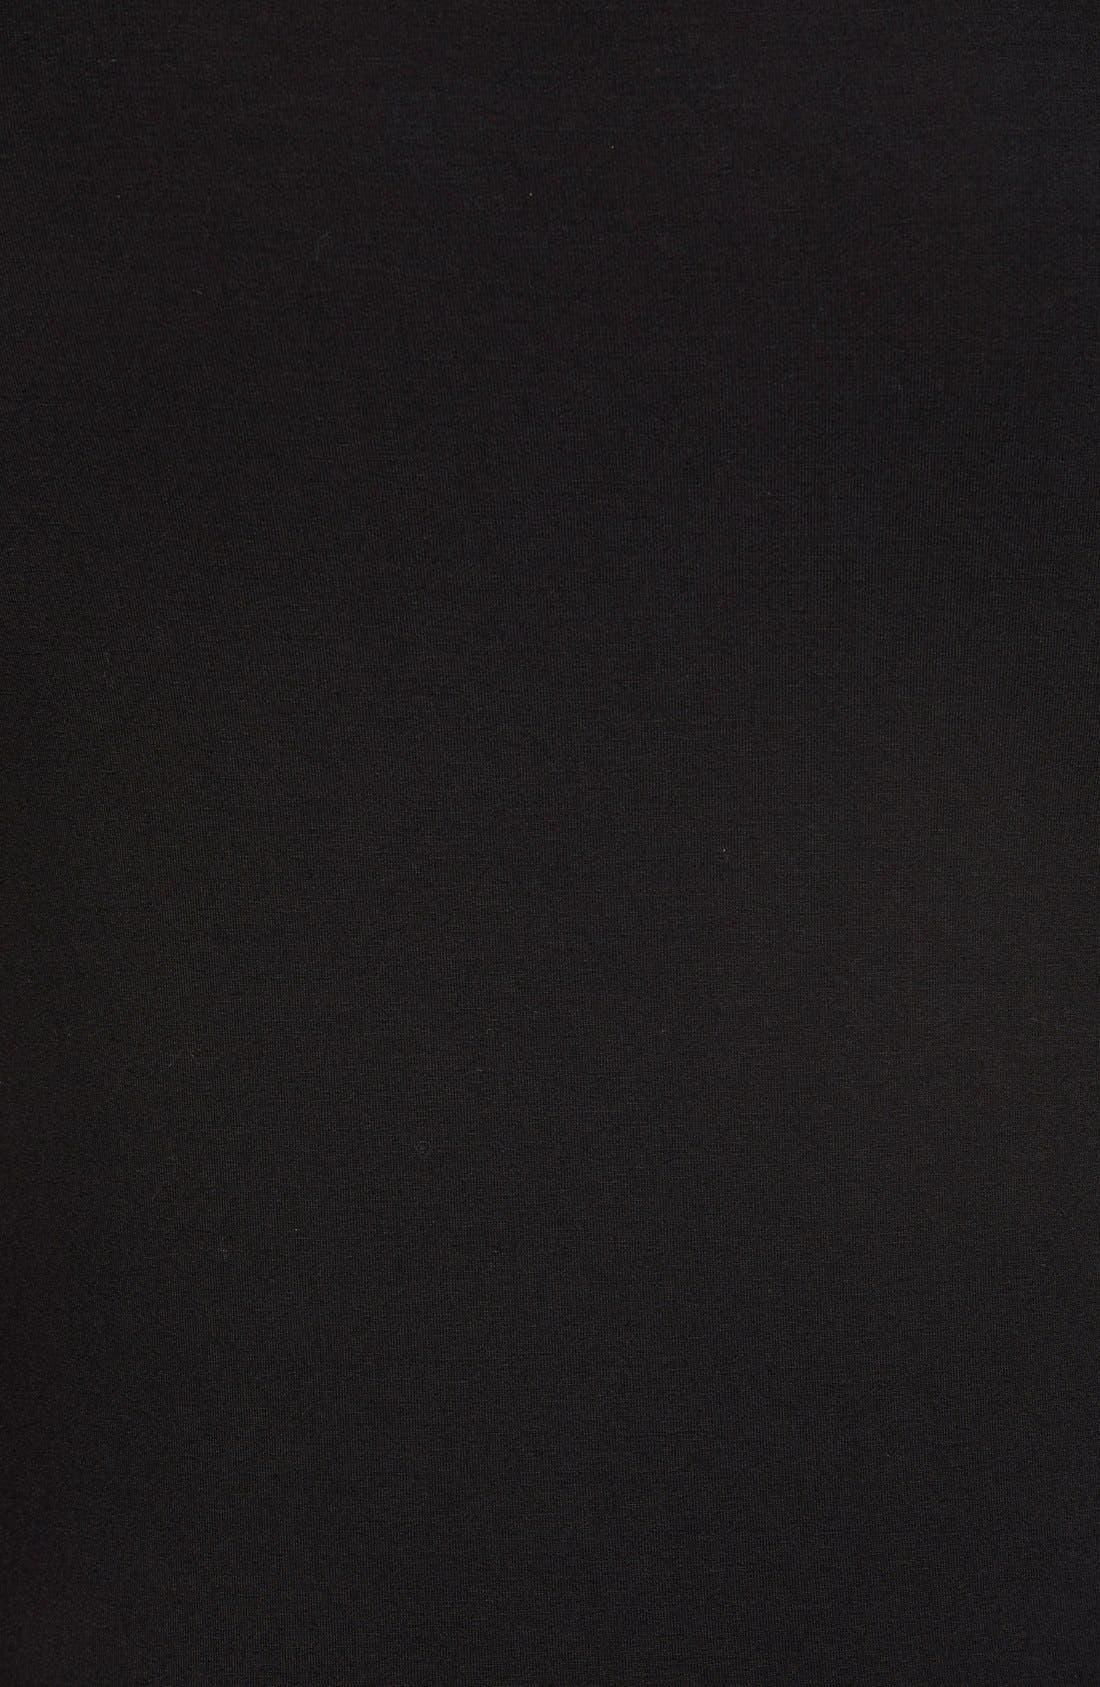 'Deneuve' Cold Shoulder Top,                             Alternate thumbnail 2, color,                             BLACK